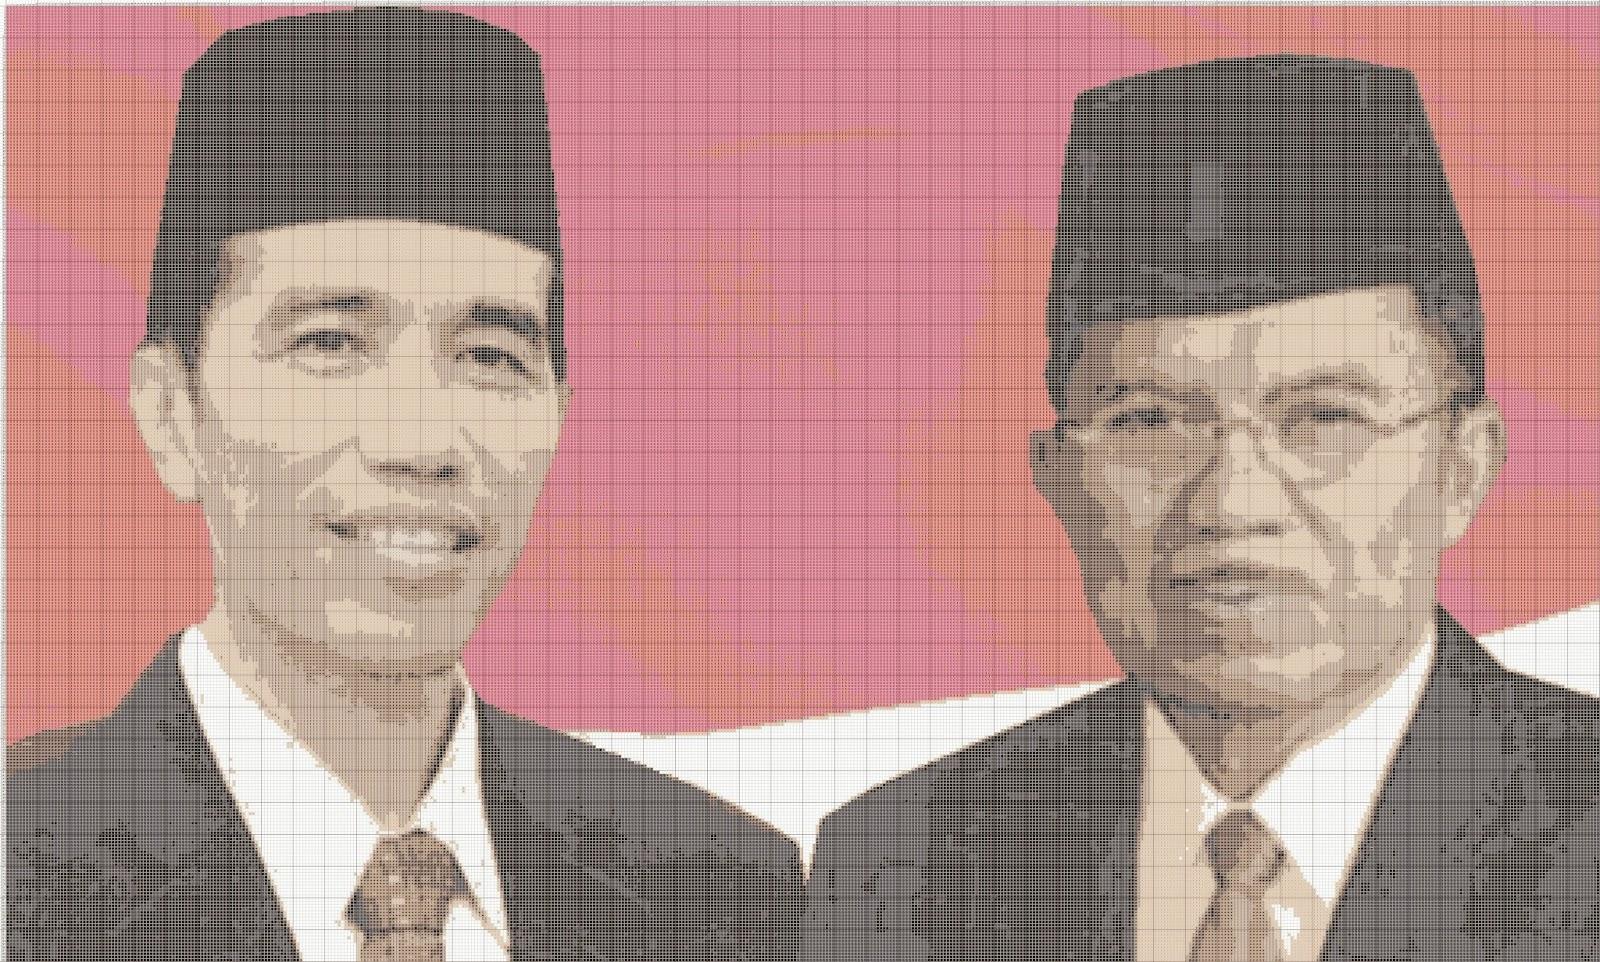 Gambar Pola Kristik Presiden RI Joko Widodo & Wapres RI Jusuf Kalla